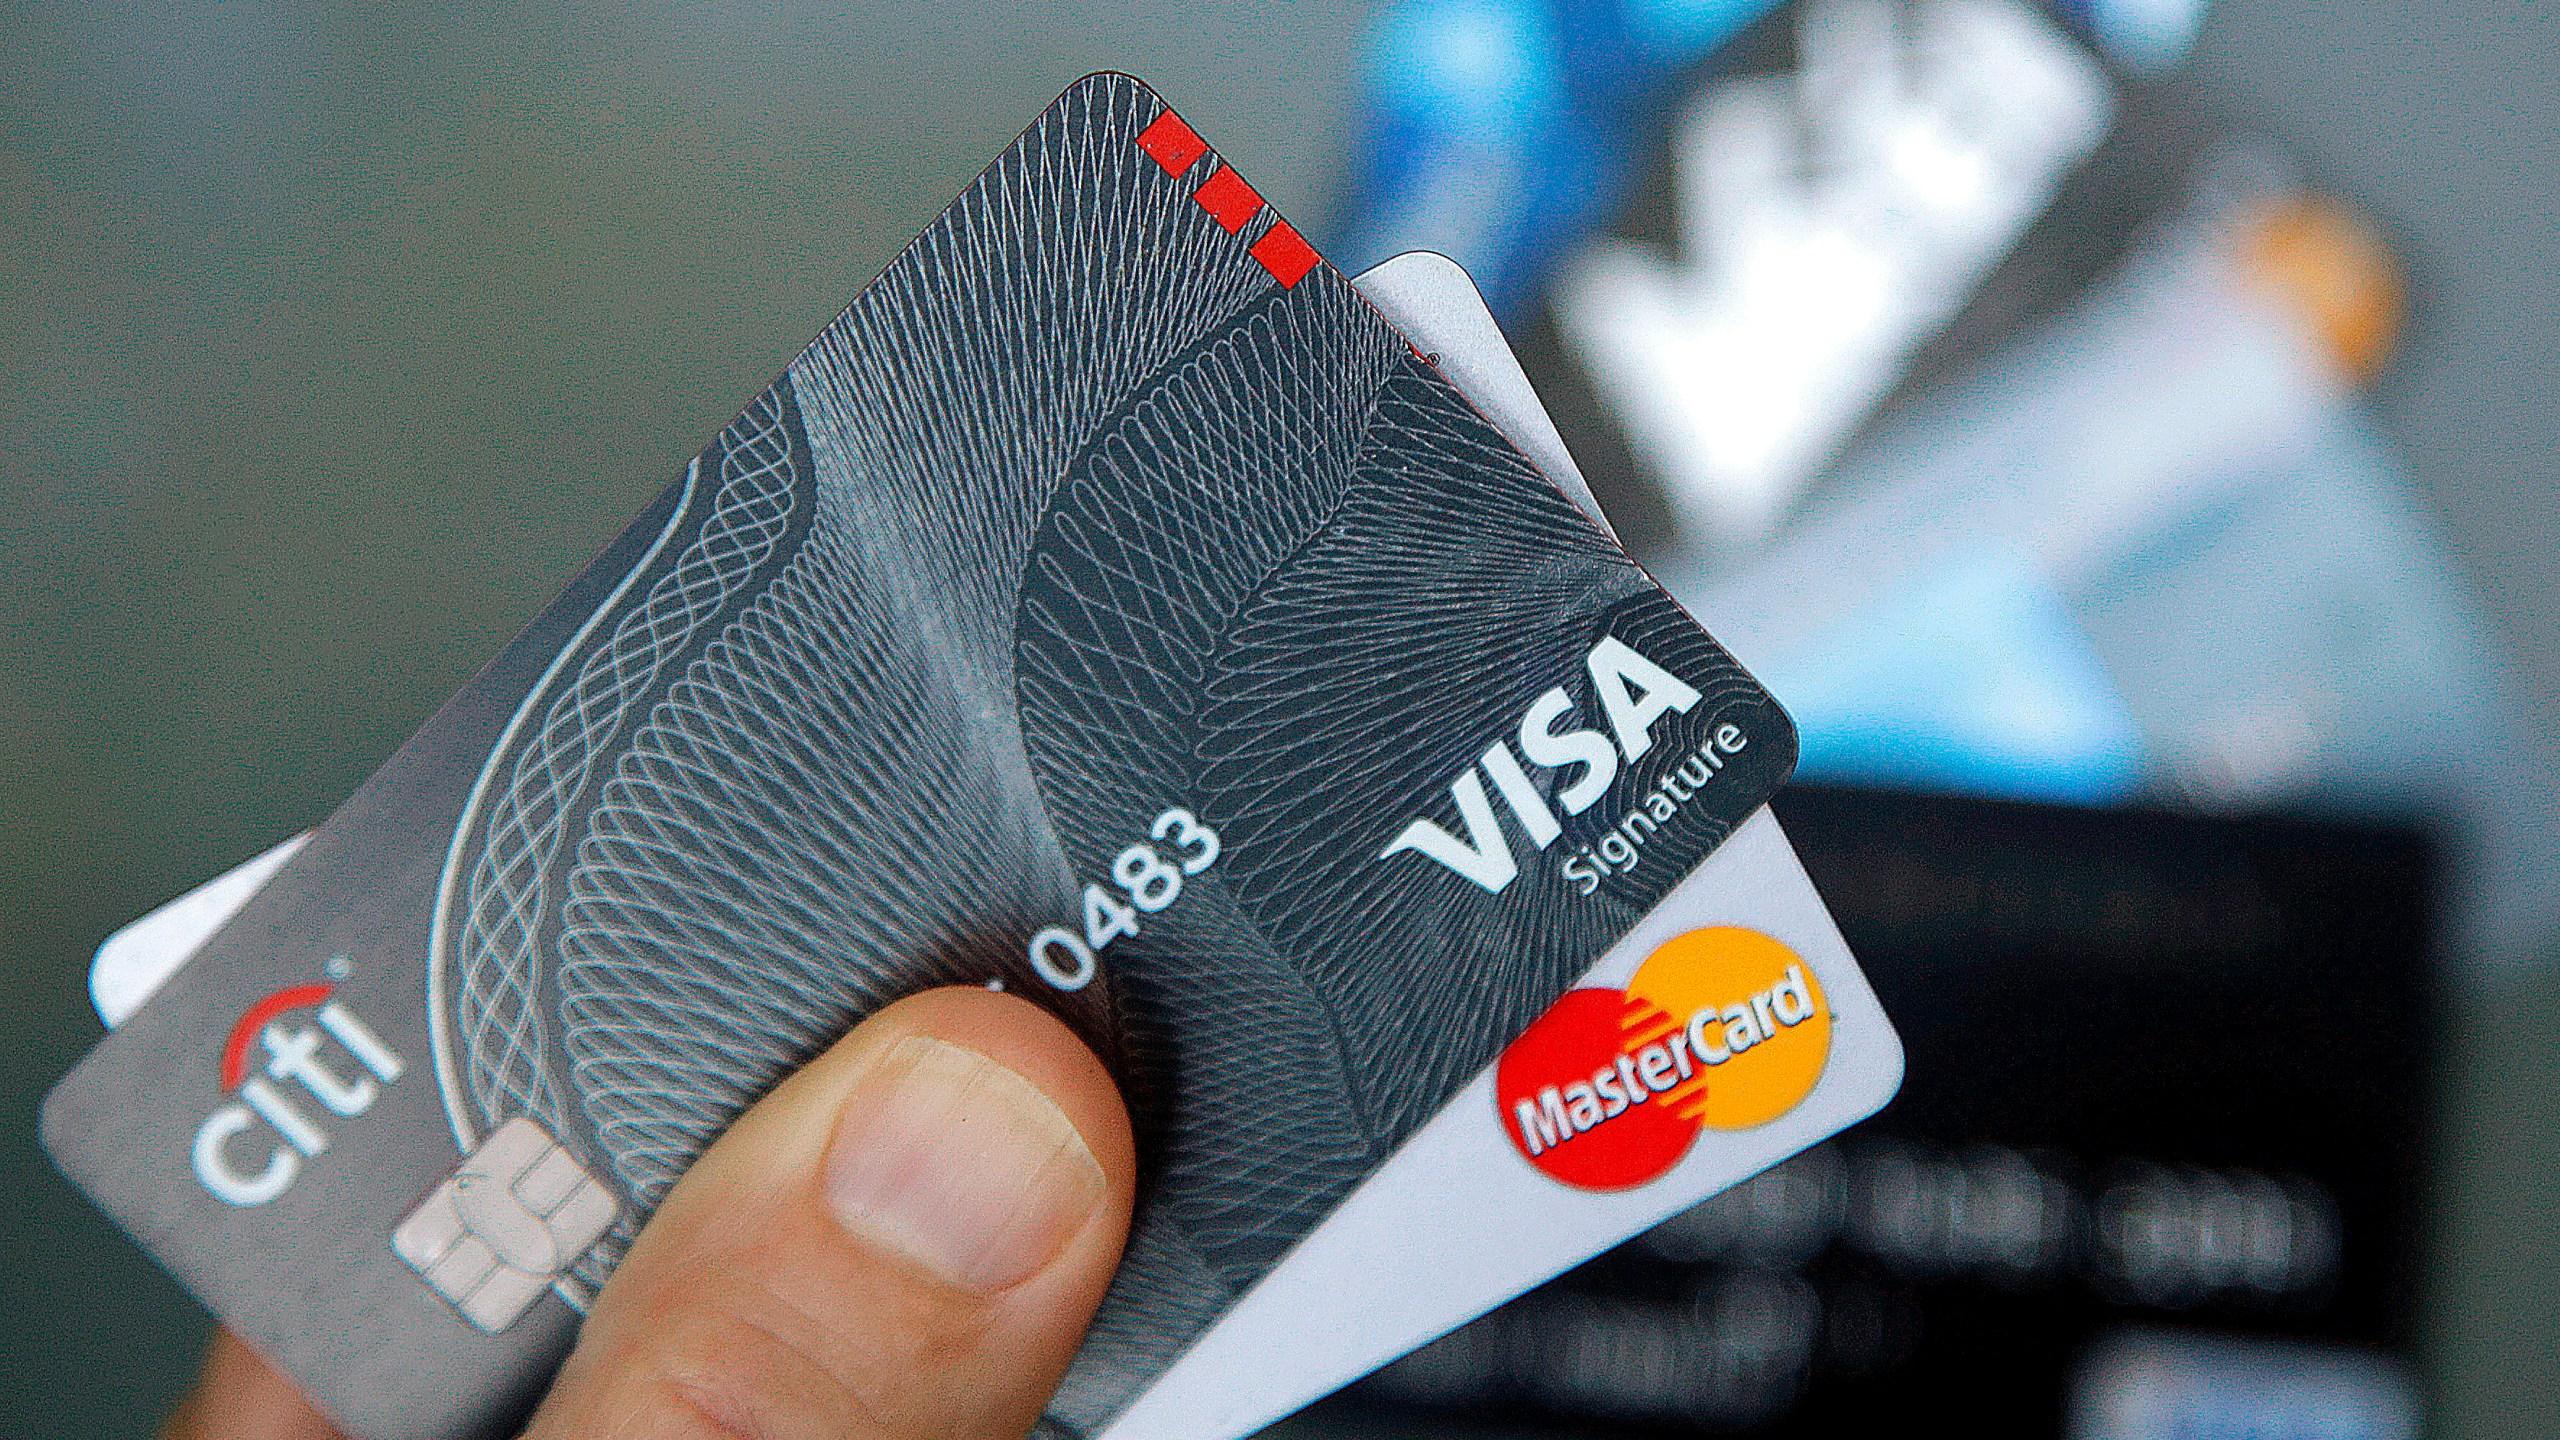 Nerdwallet_Credit_Card_Advice_30689-159532.jpg62483670